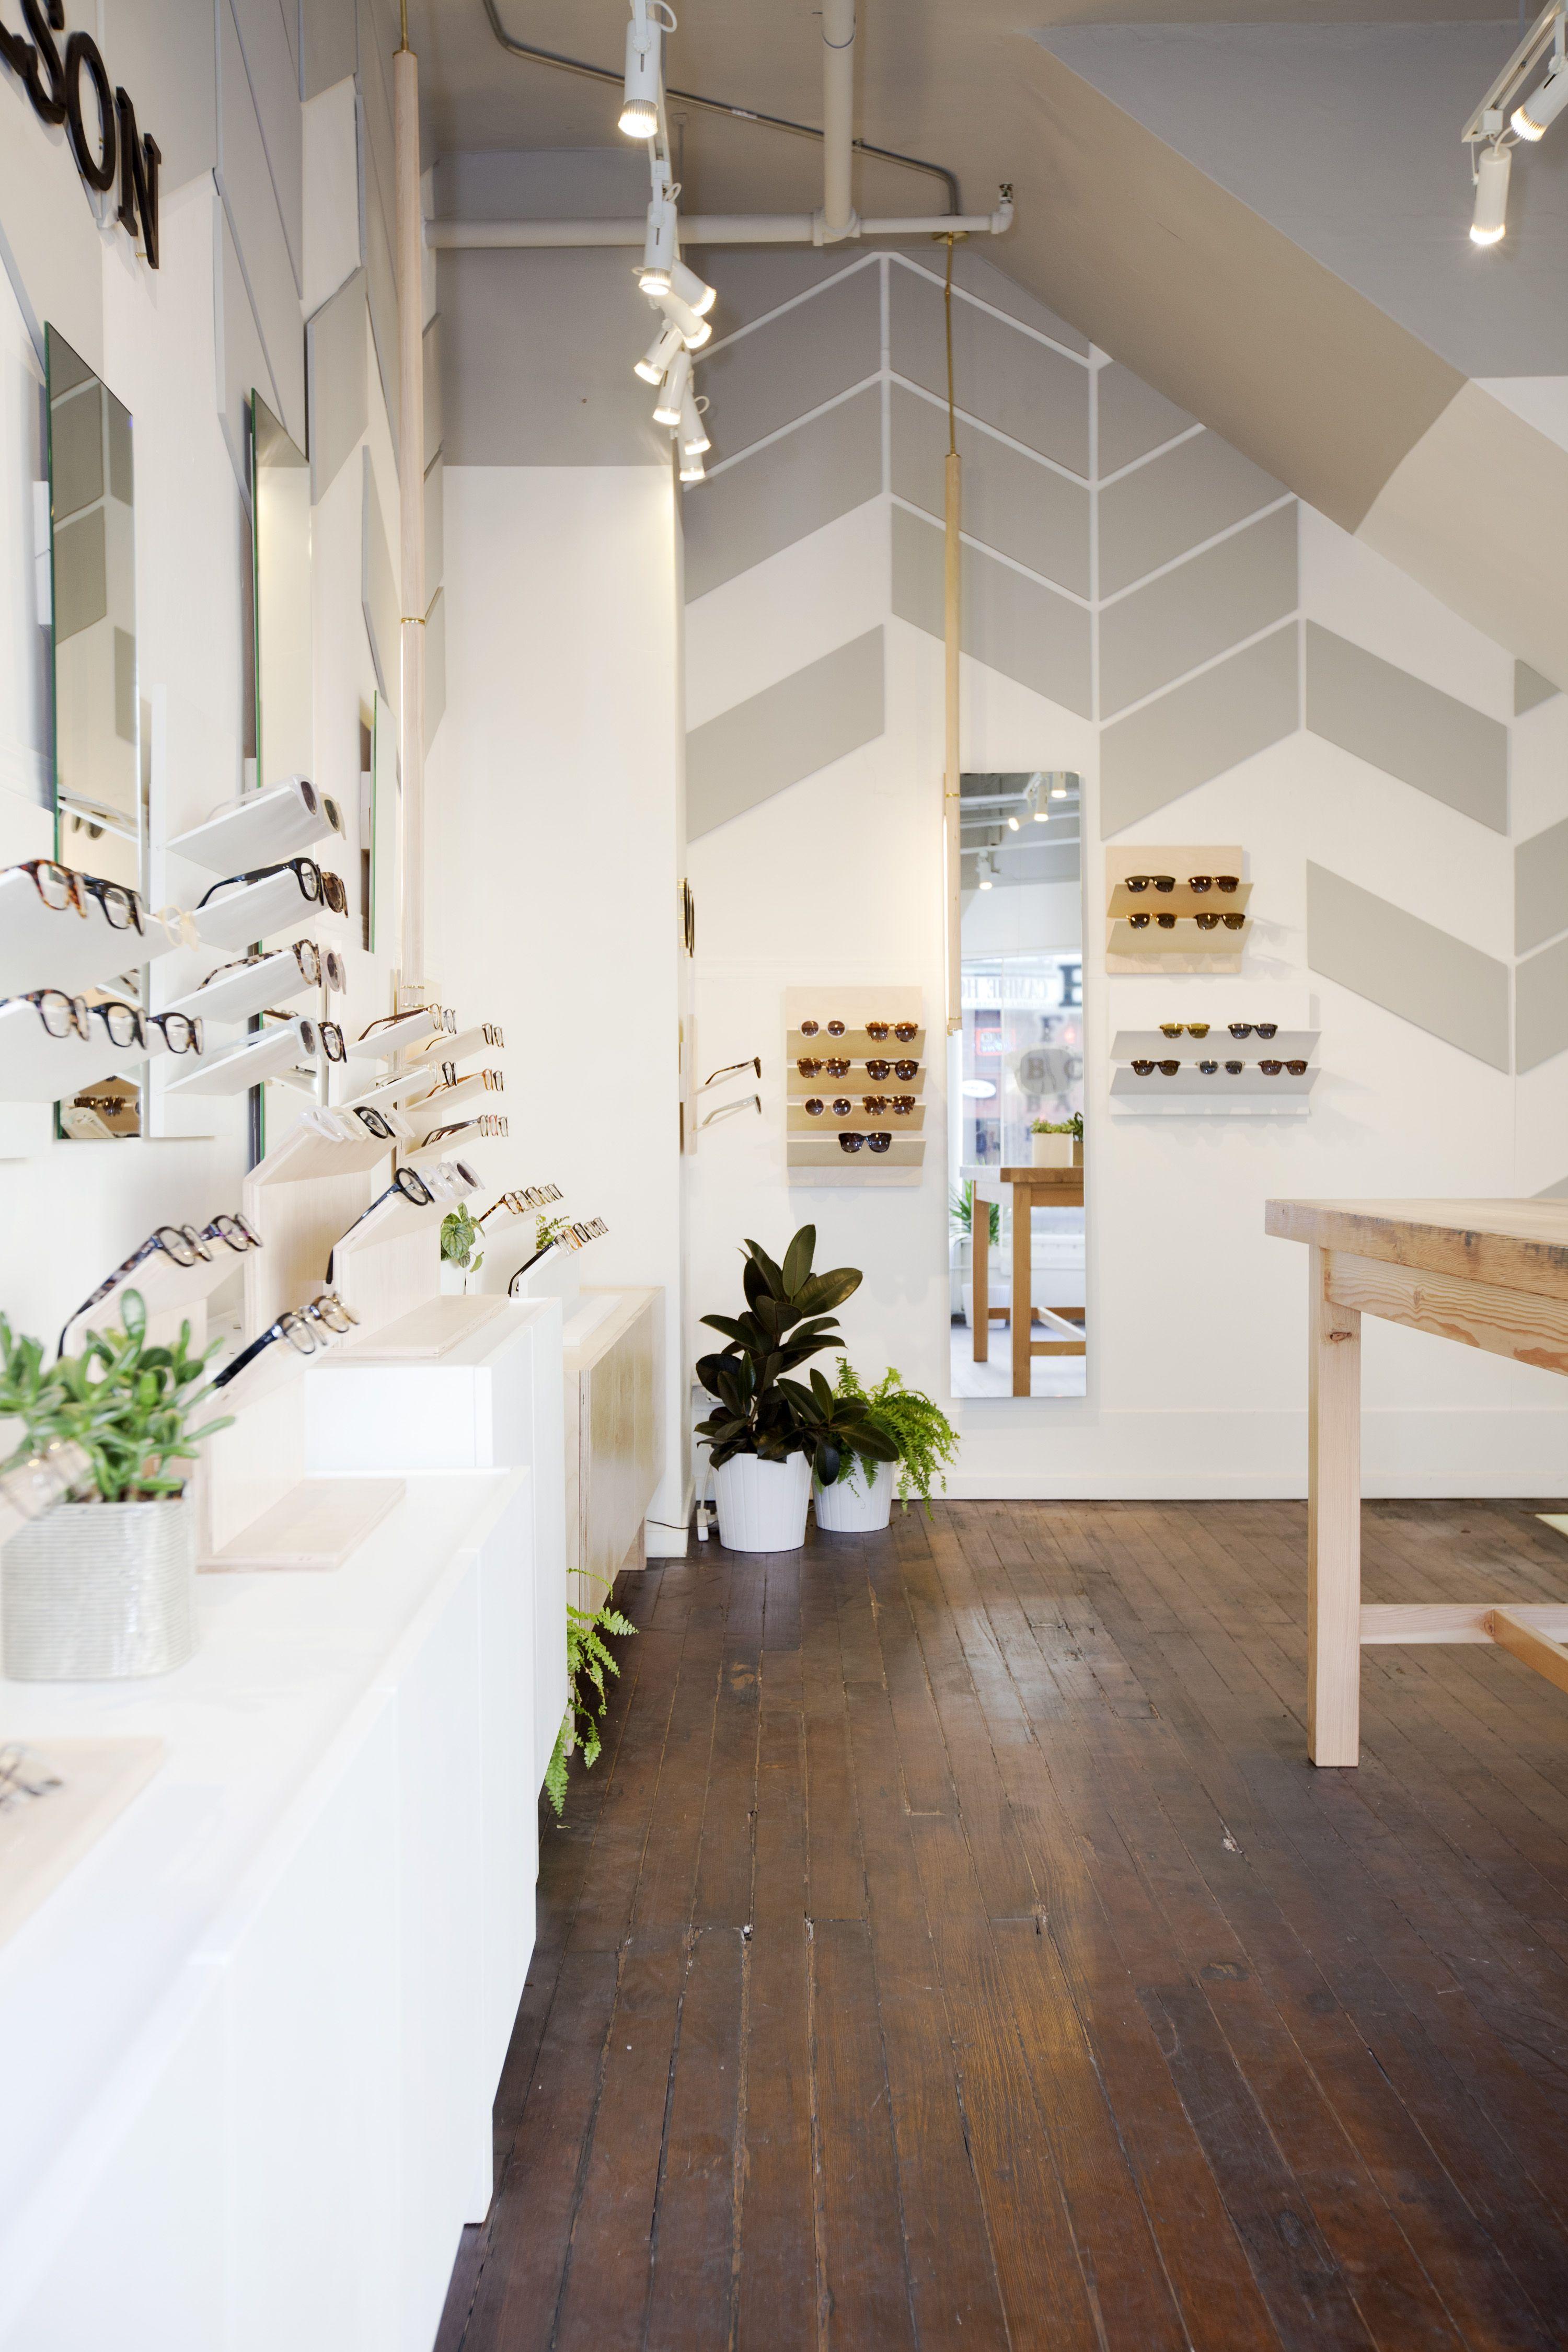 The 550 square foot flagship shop for Australian eyewear